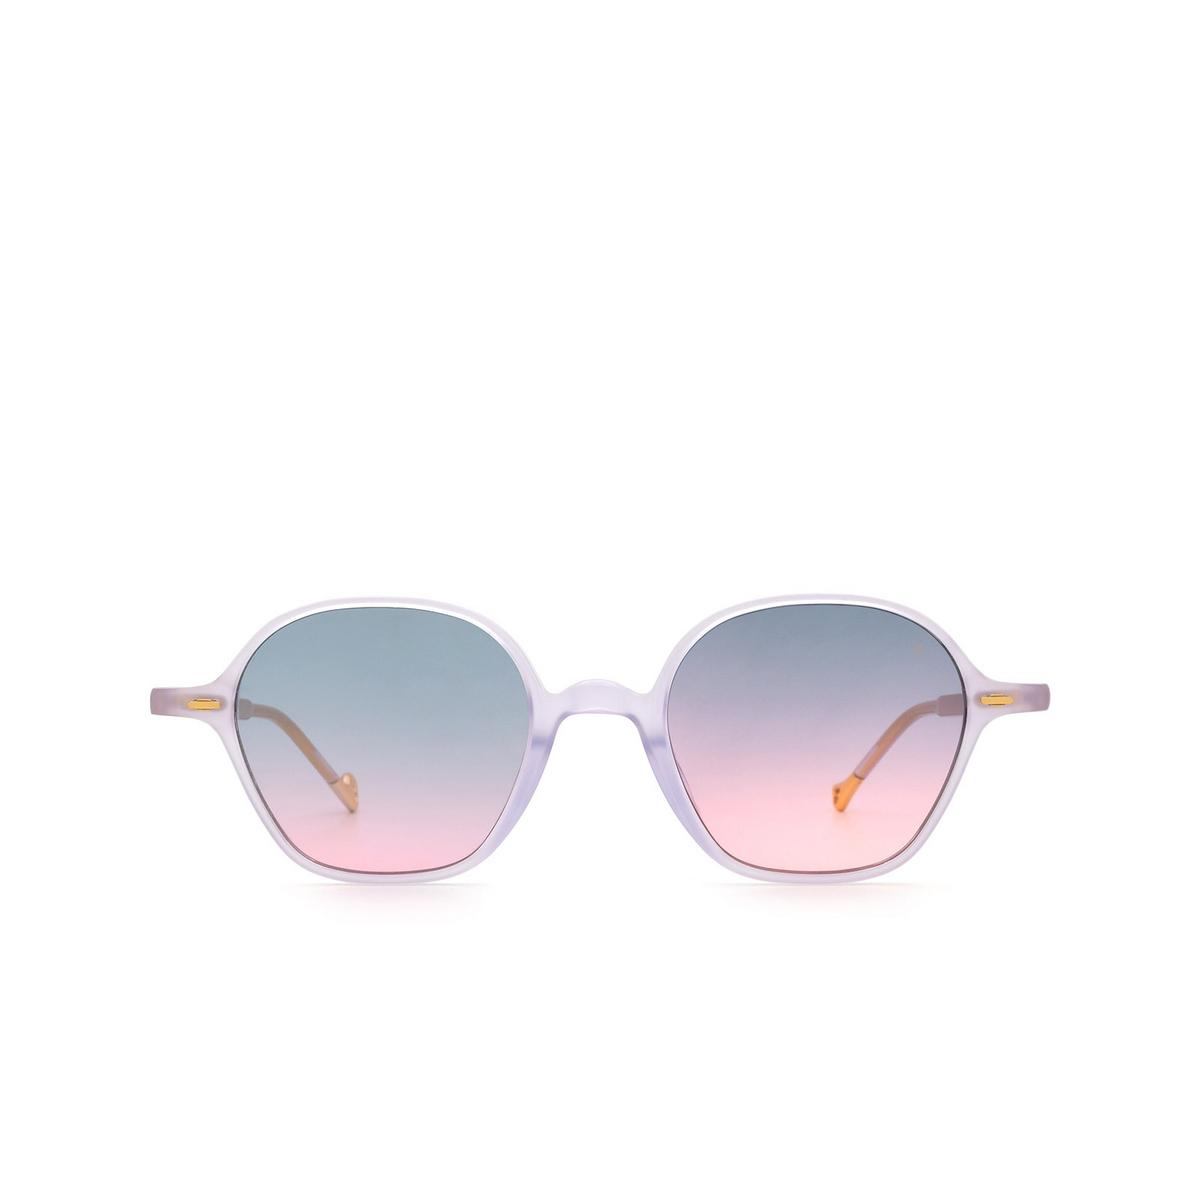 Eyepetizer® Irregular Sunglasses: Visconti color Lilac C.B/B-20 - front view.